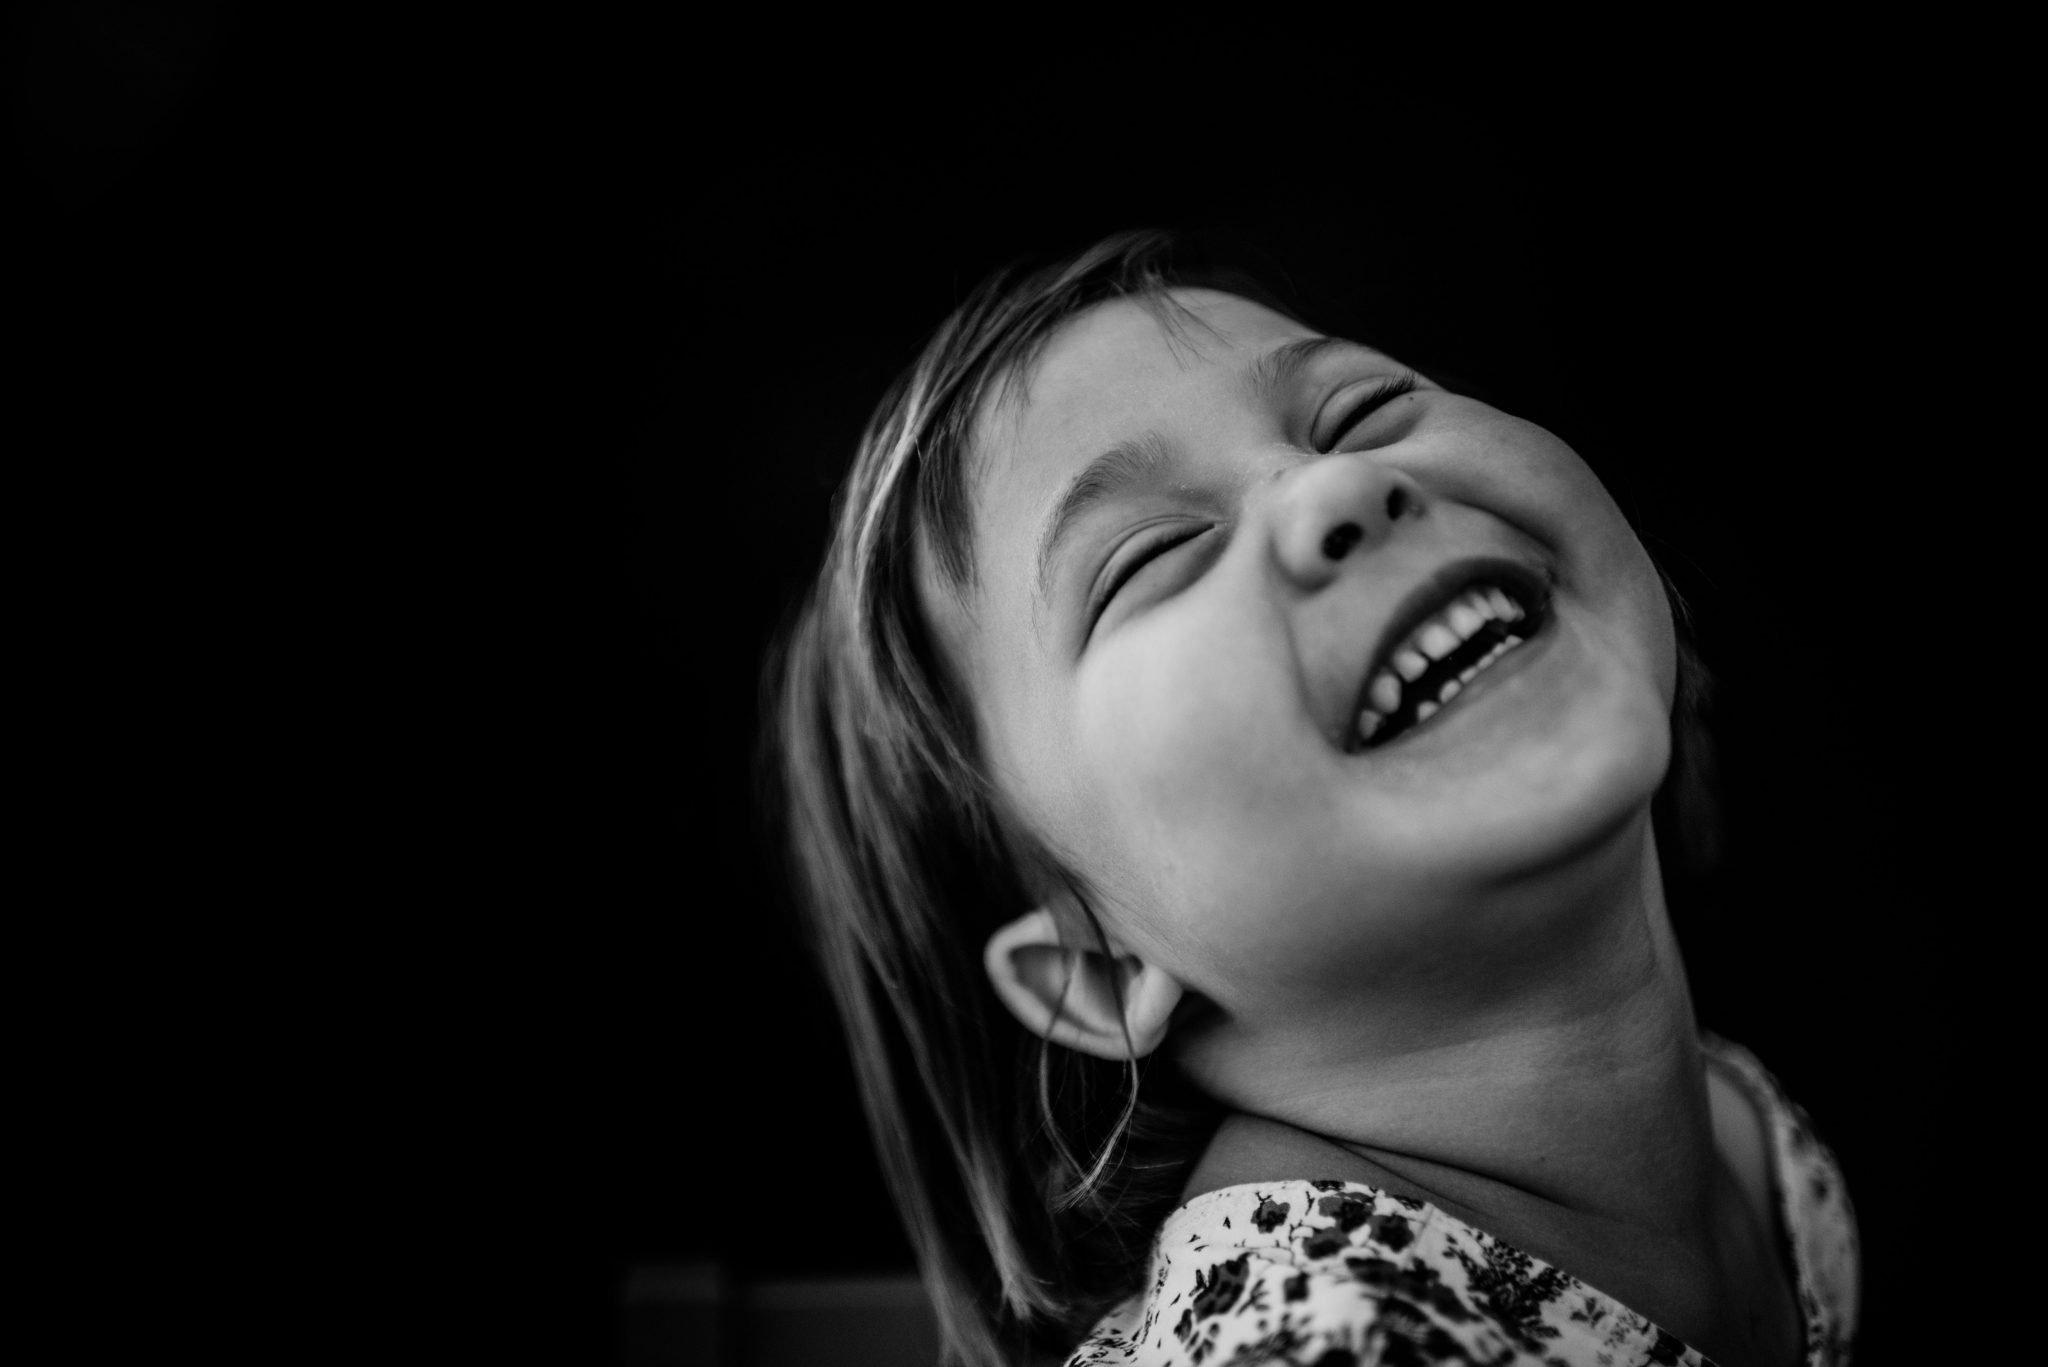 childrens_kids_Back_to_school_portraits_spokane_photographer_11